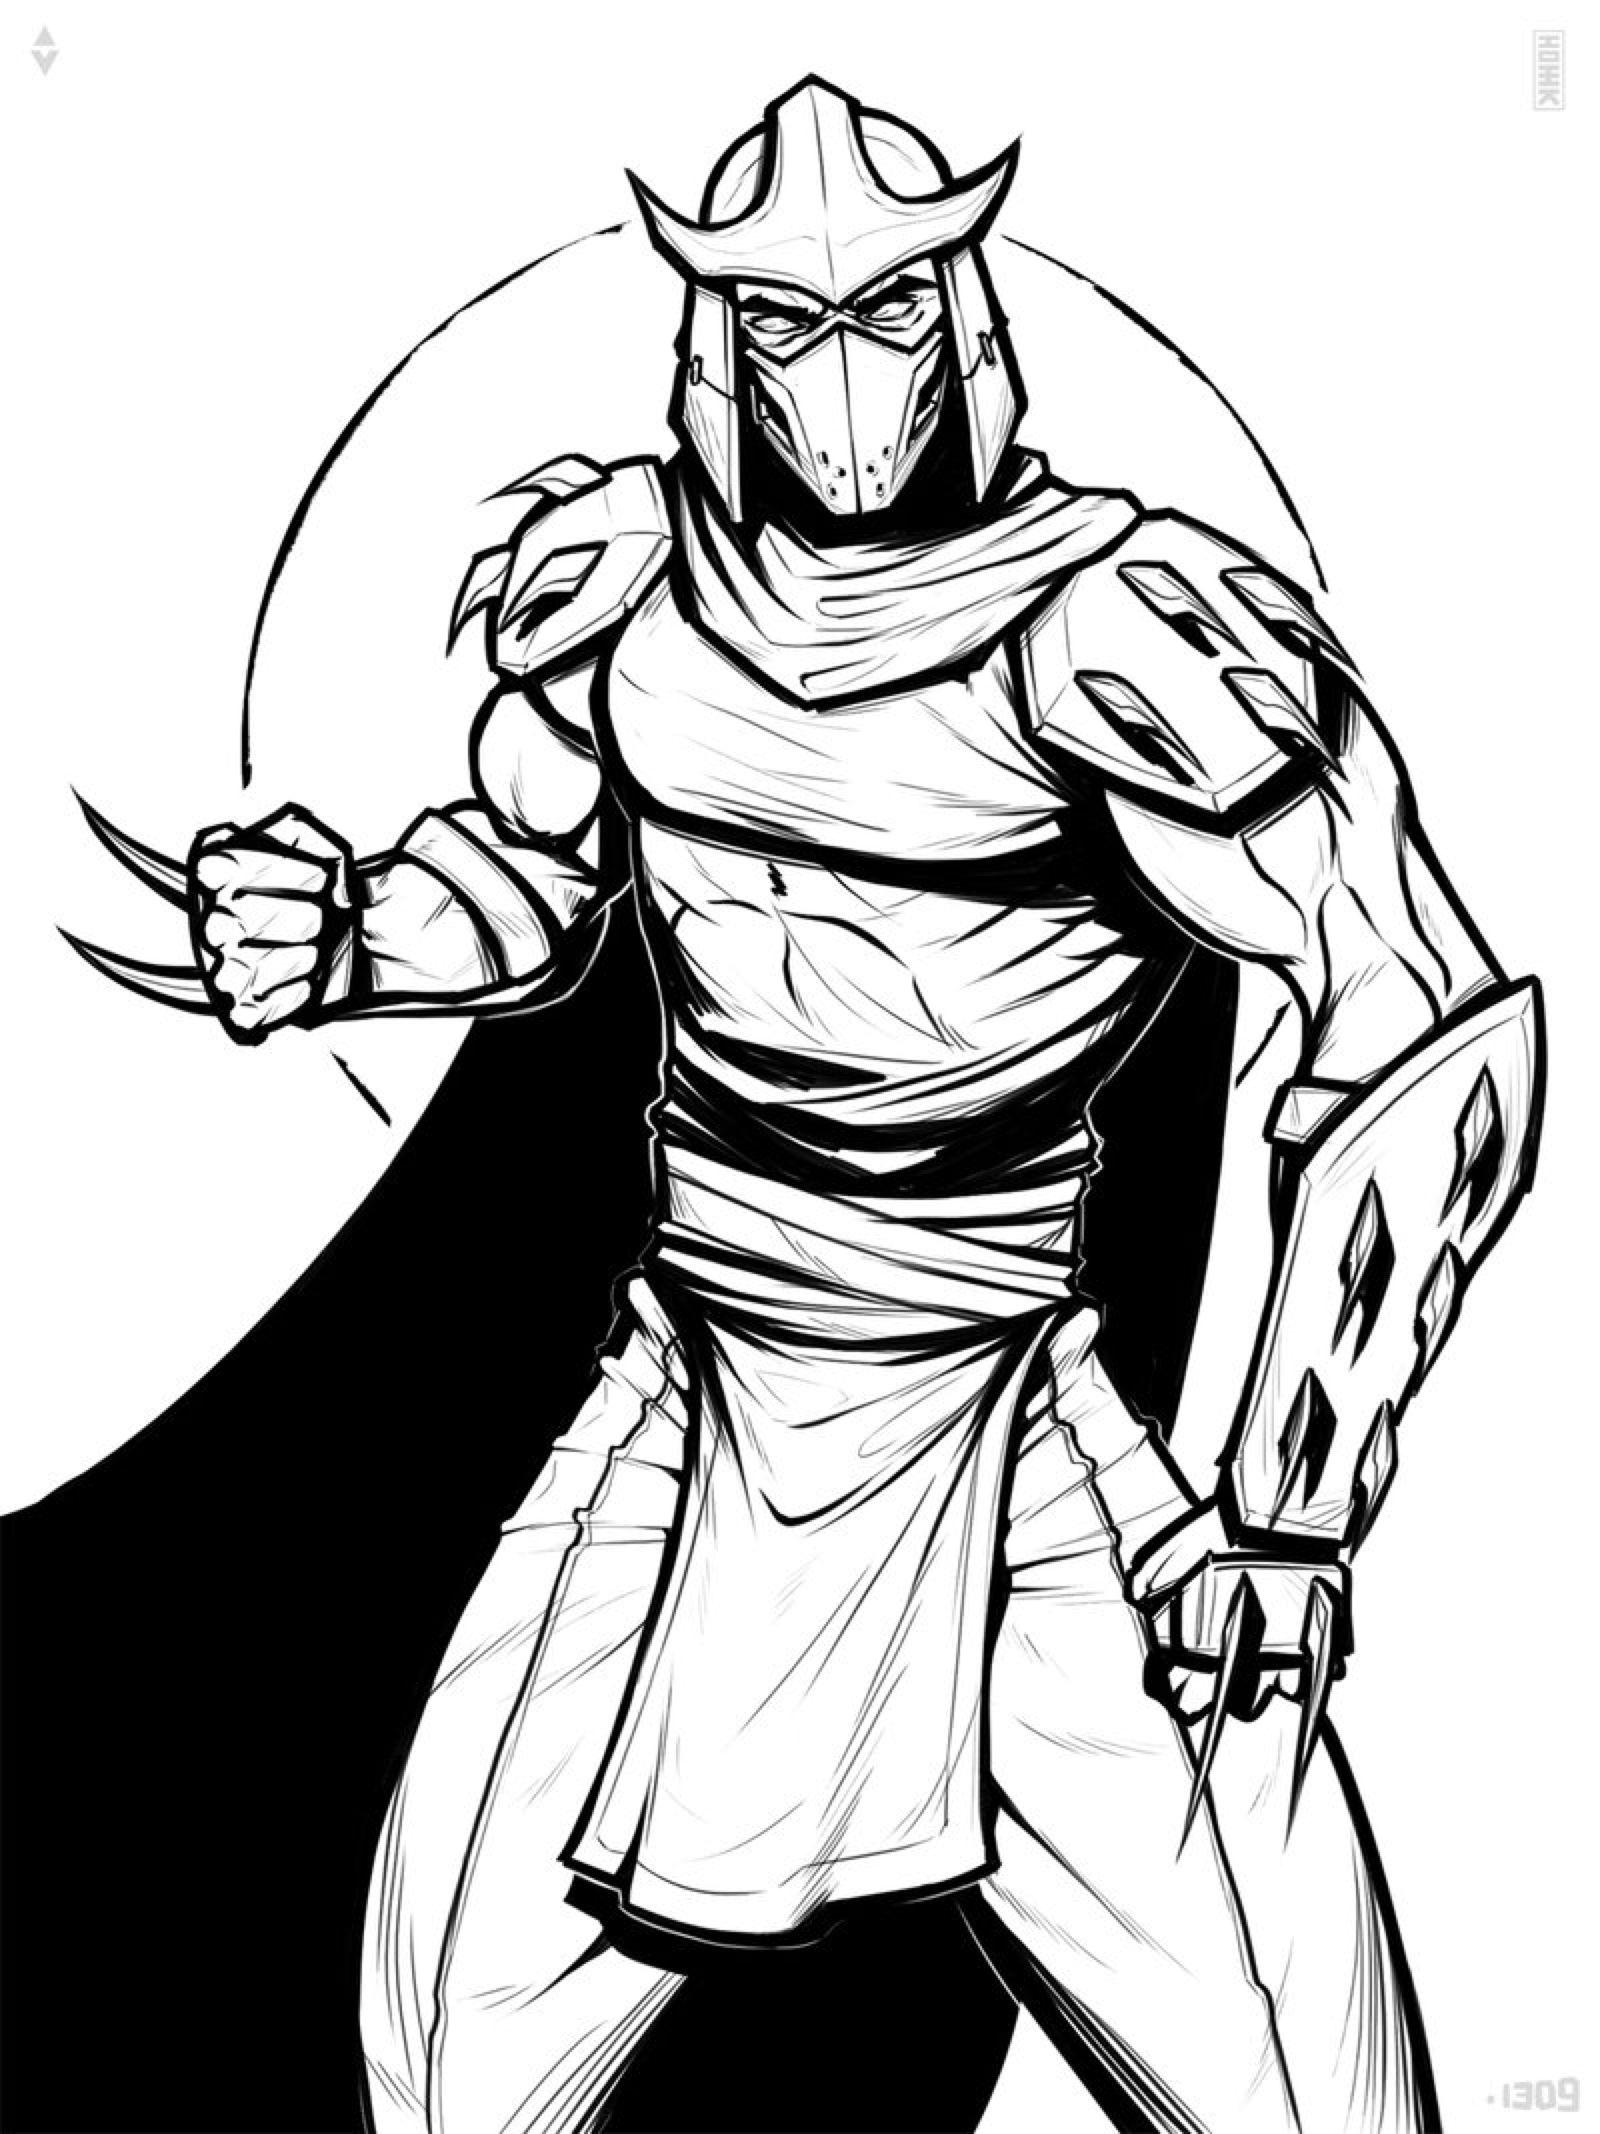 1309 | Shredder! by Nozhk on @DeviantArt | COMICS | Pinterest ...